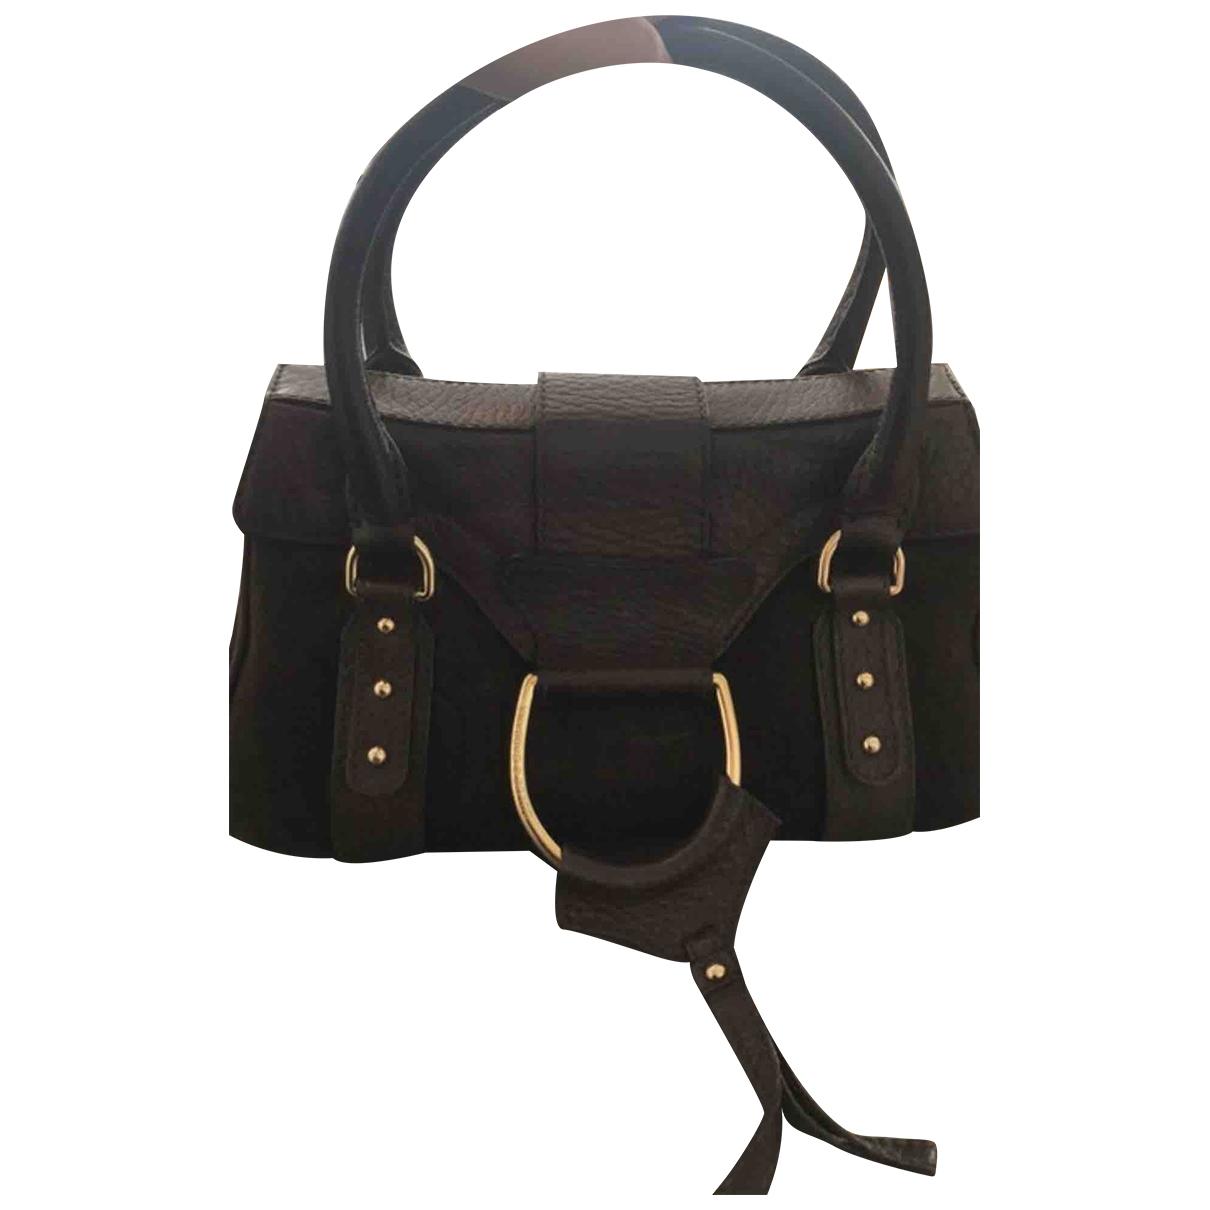 Dolce & Gabbana \N Brown Leather handbag for Women \N